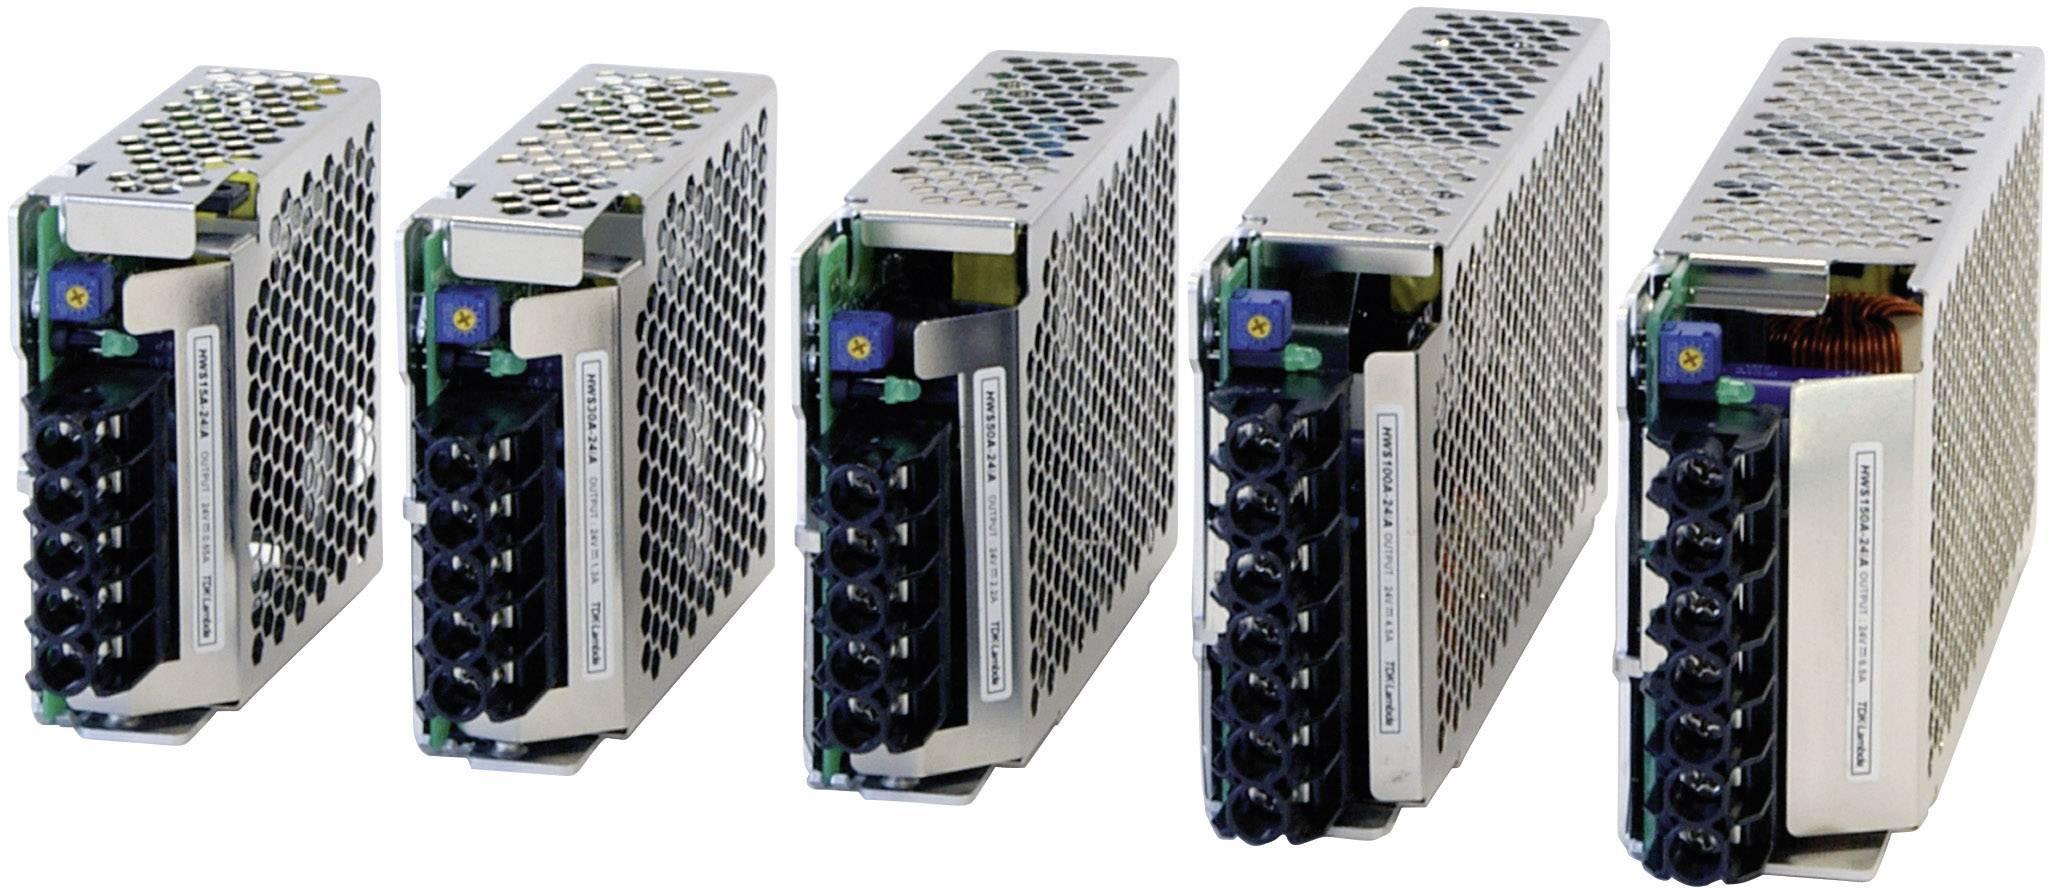 Zabudovateľný napájací zdroj TDK-Lambda HWS-50A-5, 5 V, 50 W